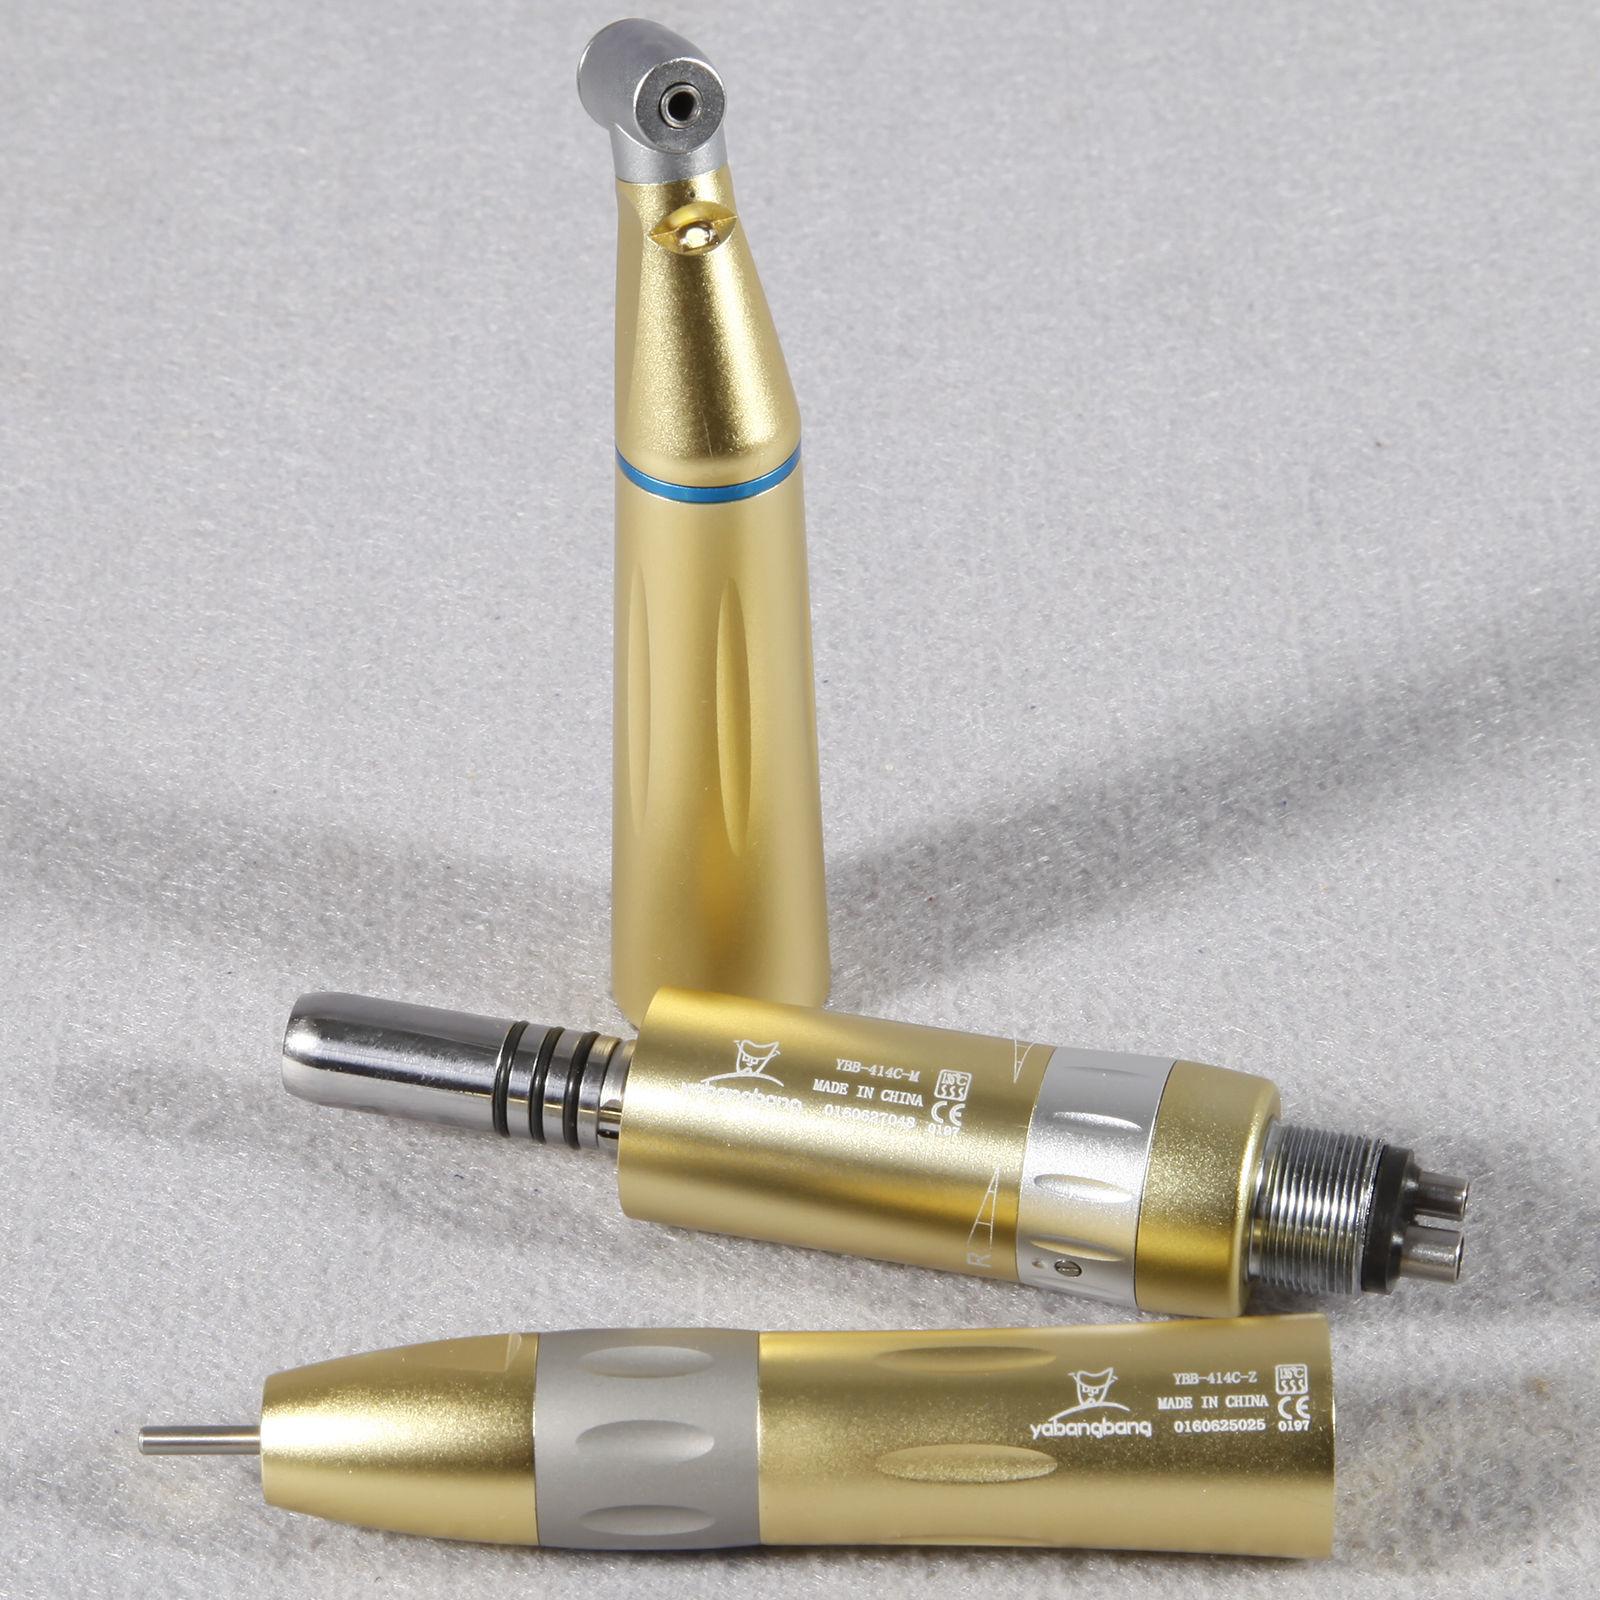 Kavo Style Dental LED Internal Low Speed Handpiece Kit E generator 4 Hole Gold Y